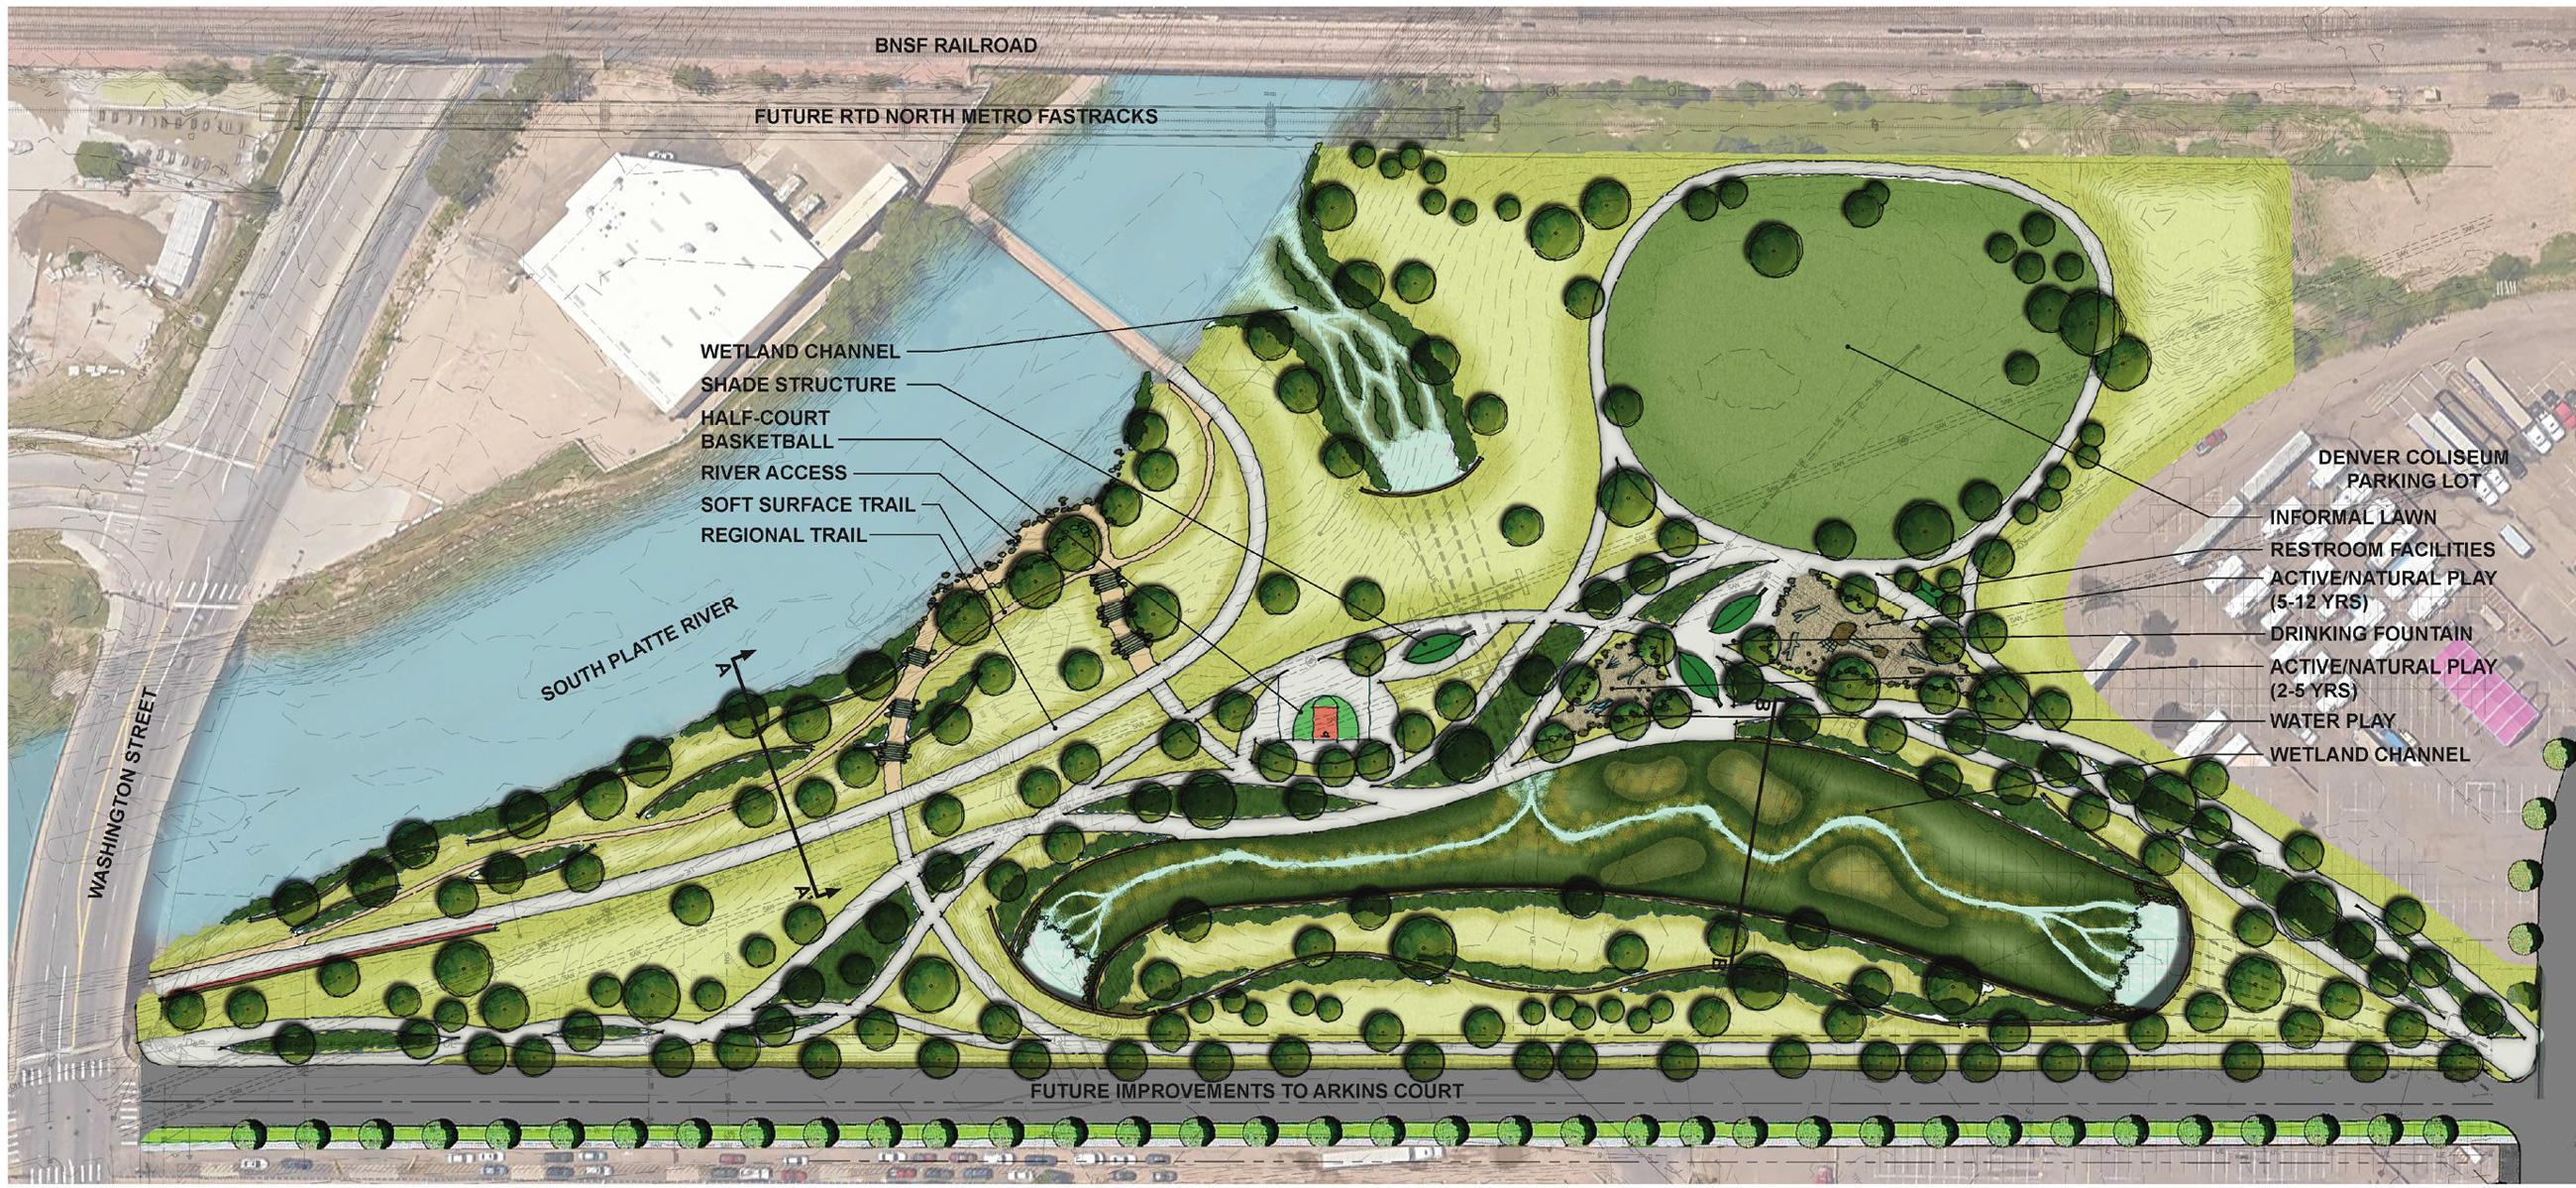 globeville landing park concept designs may 2016 platte to park hill stormwater systems. Black Bedroom Furniture Sets. Home Design Ideas